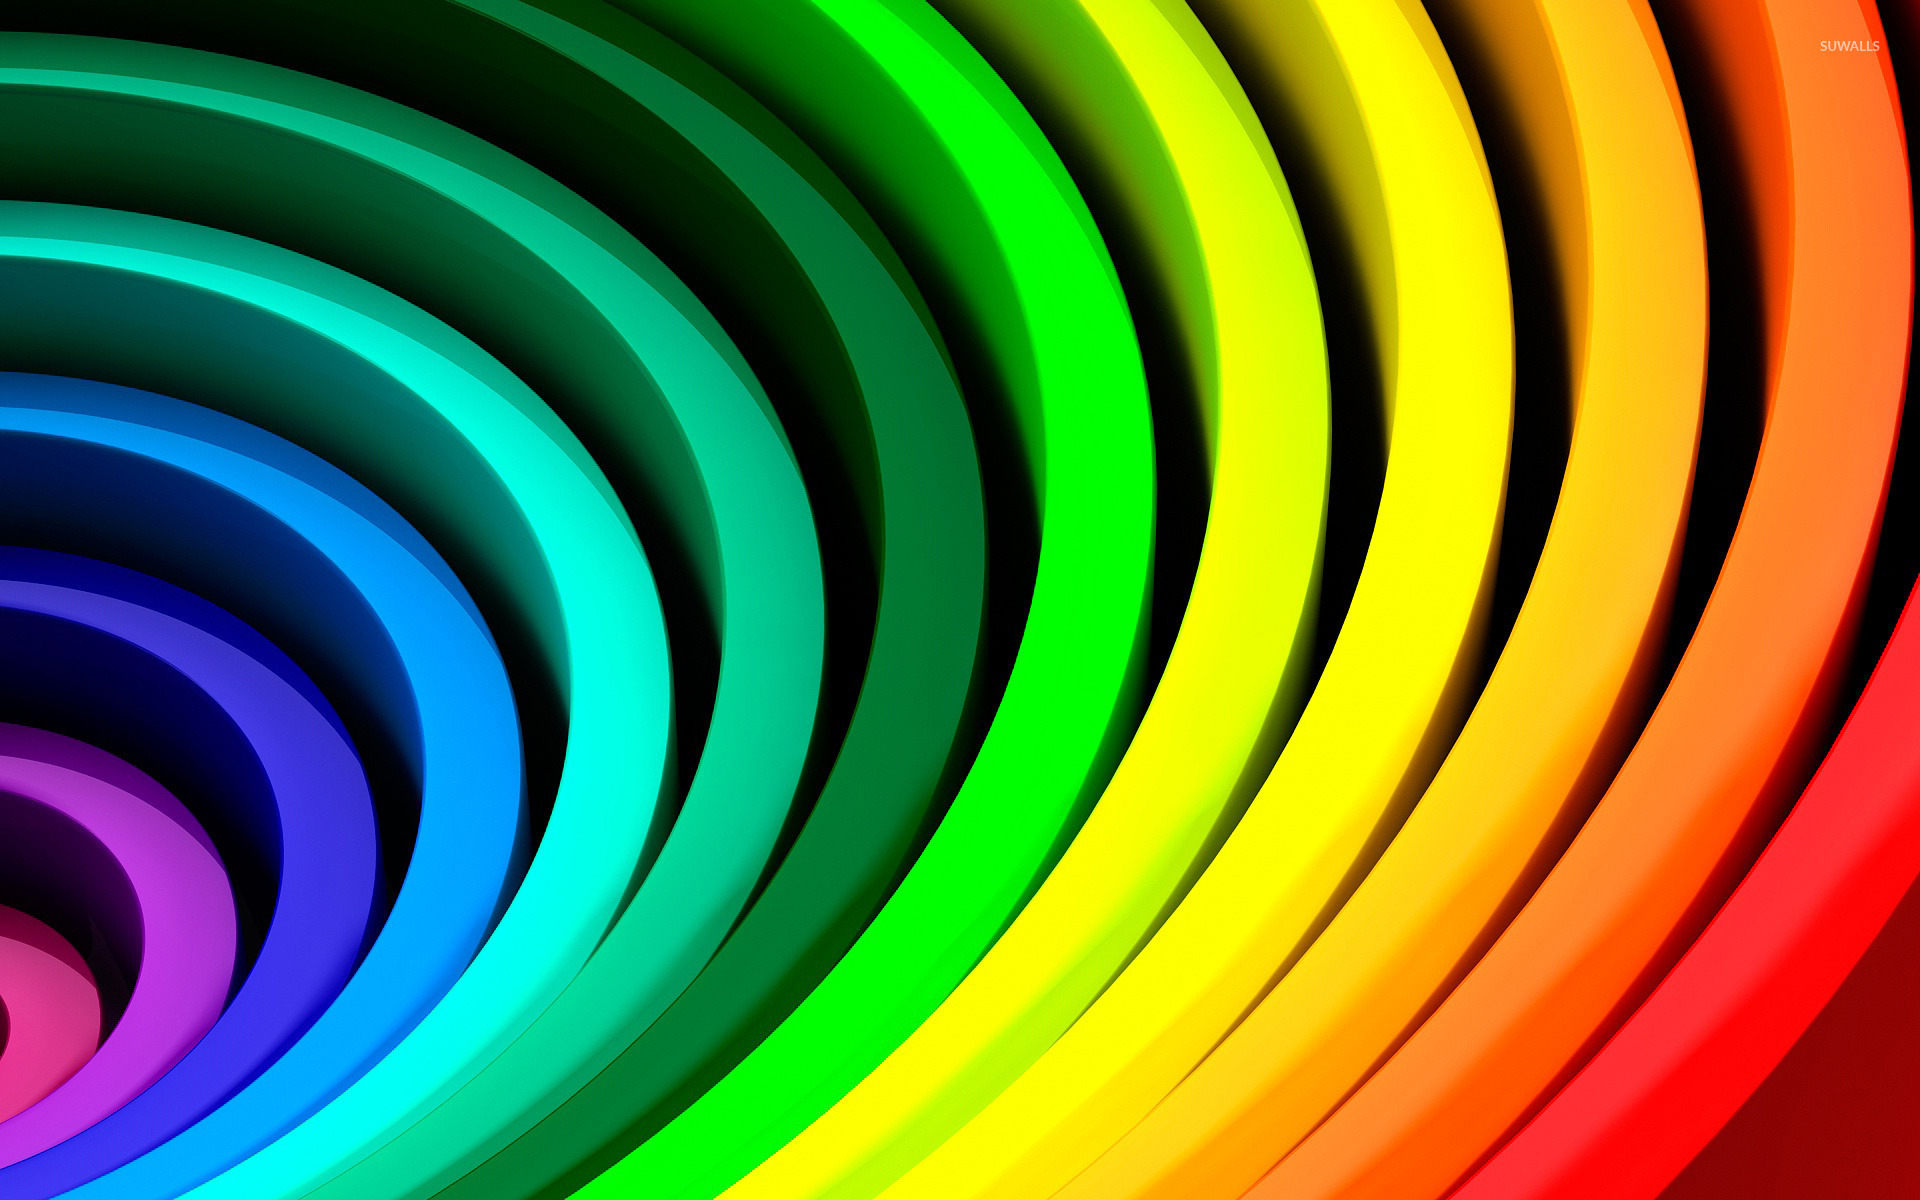 Memes Wallpaper 3d Rainbow Rings Wallpaper 3d Wallpapers 22860